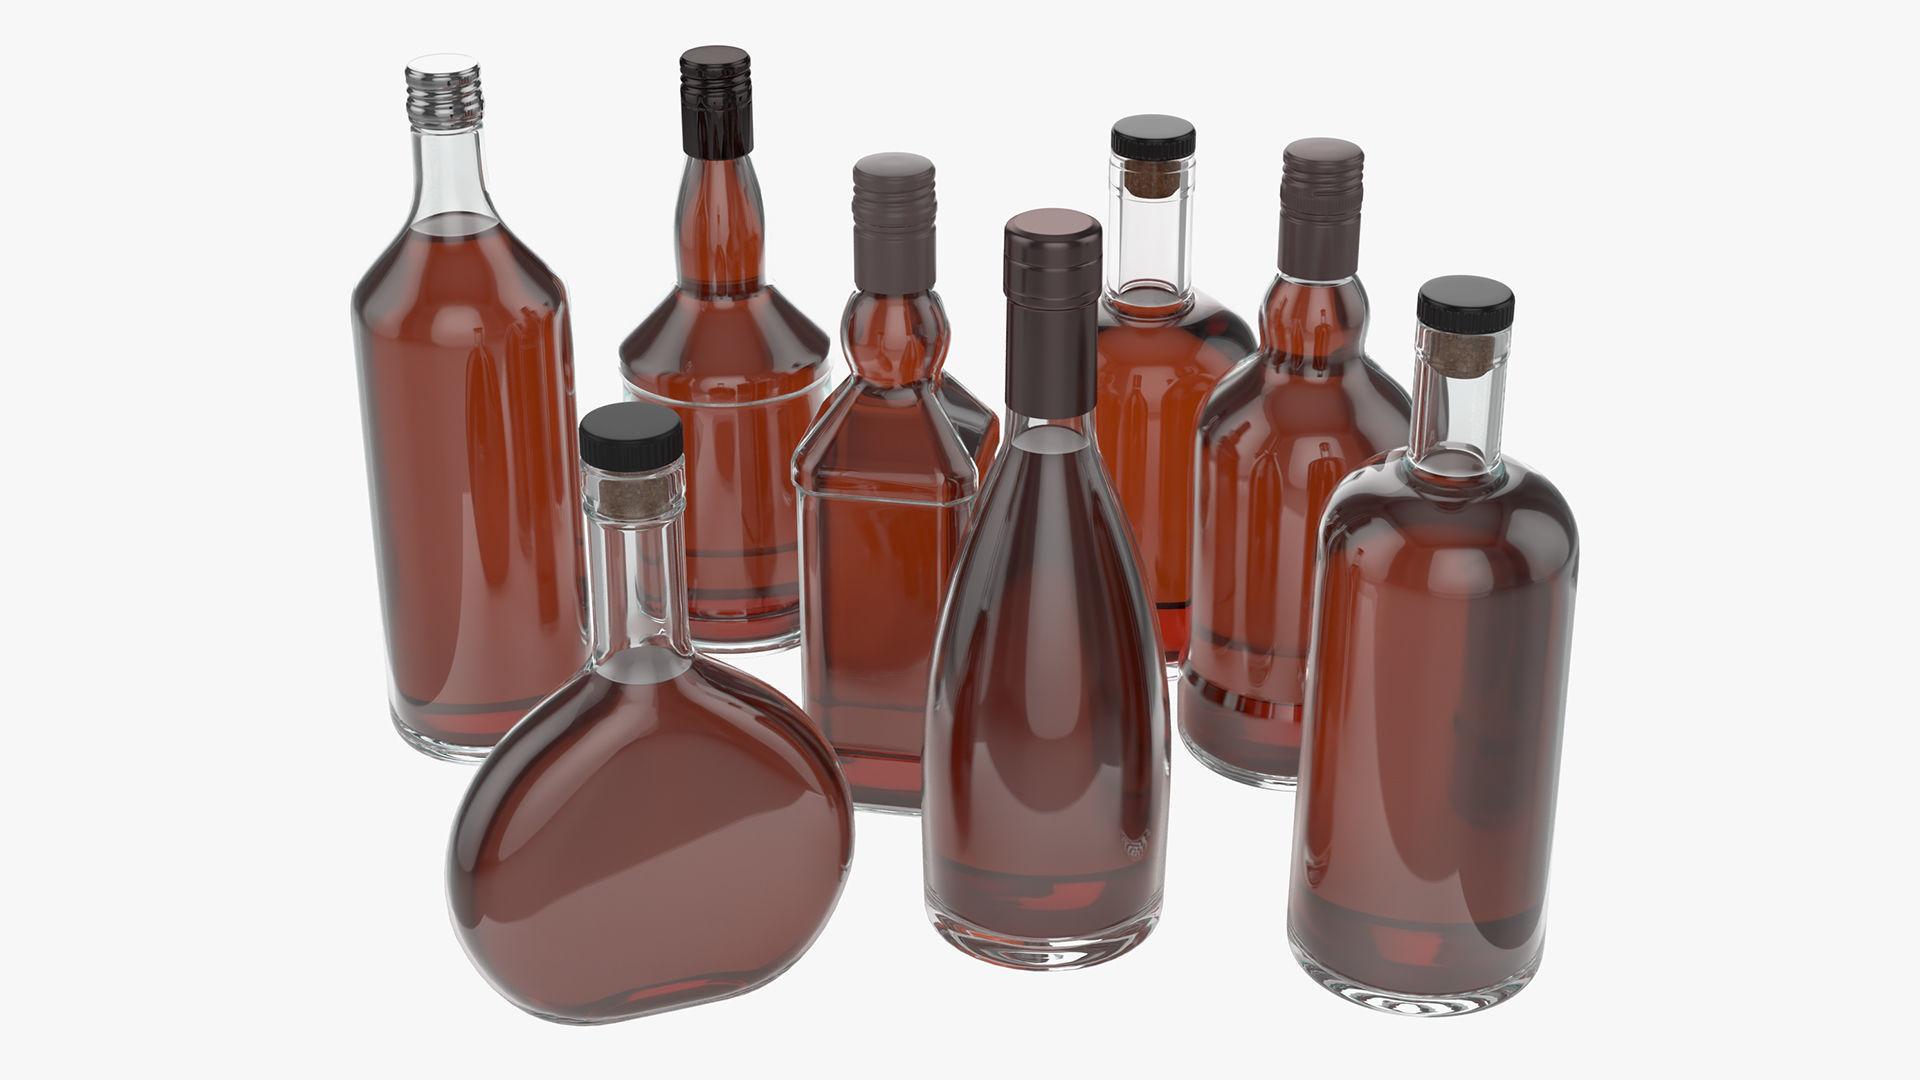 whiskey glass bottles vol1